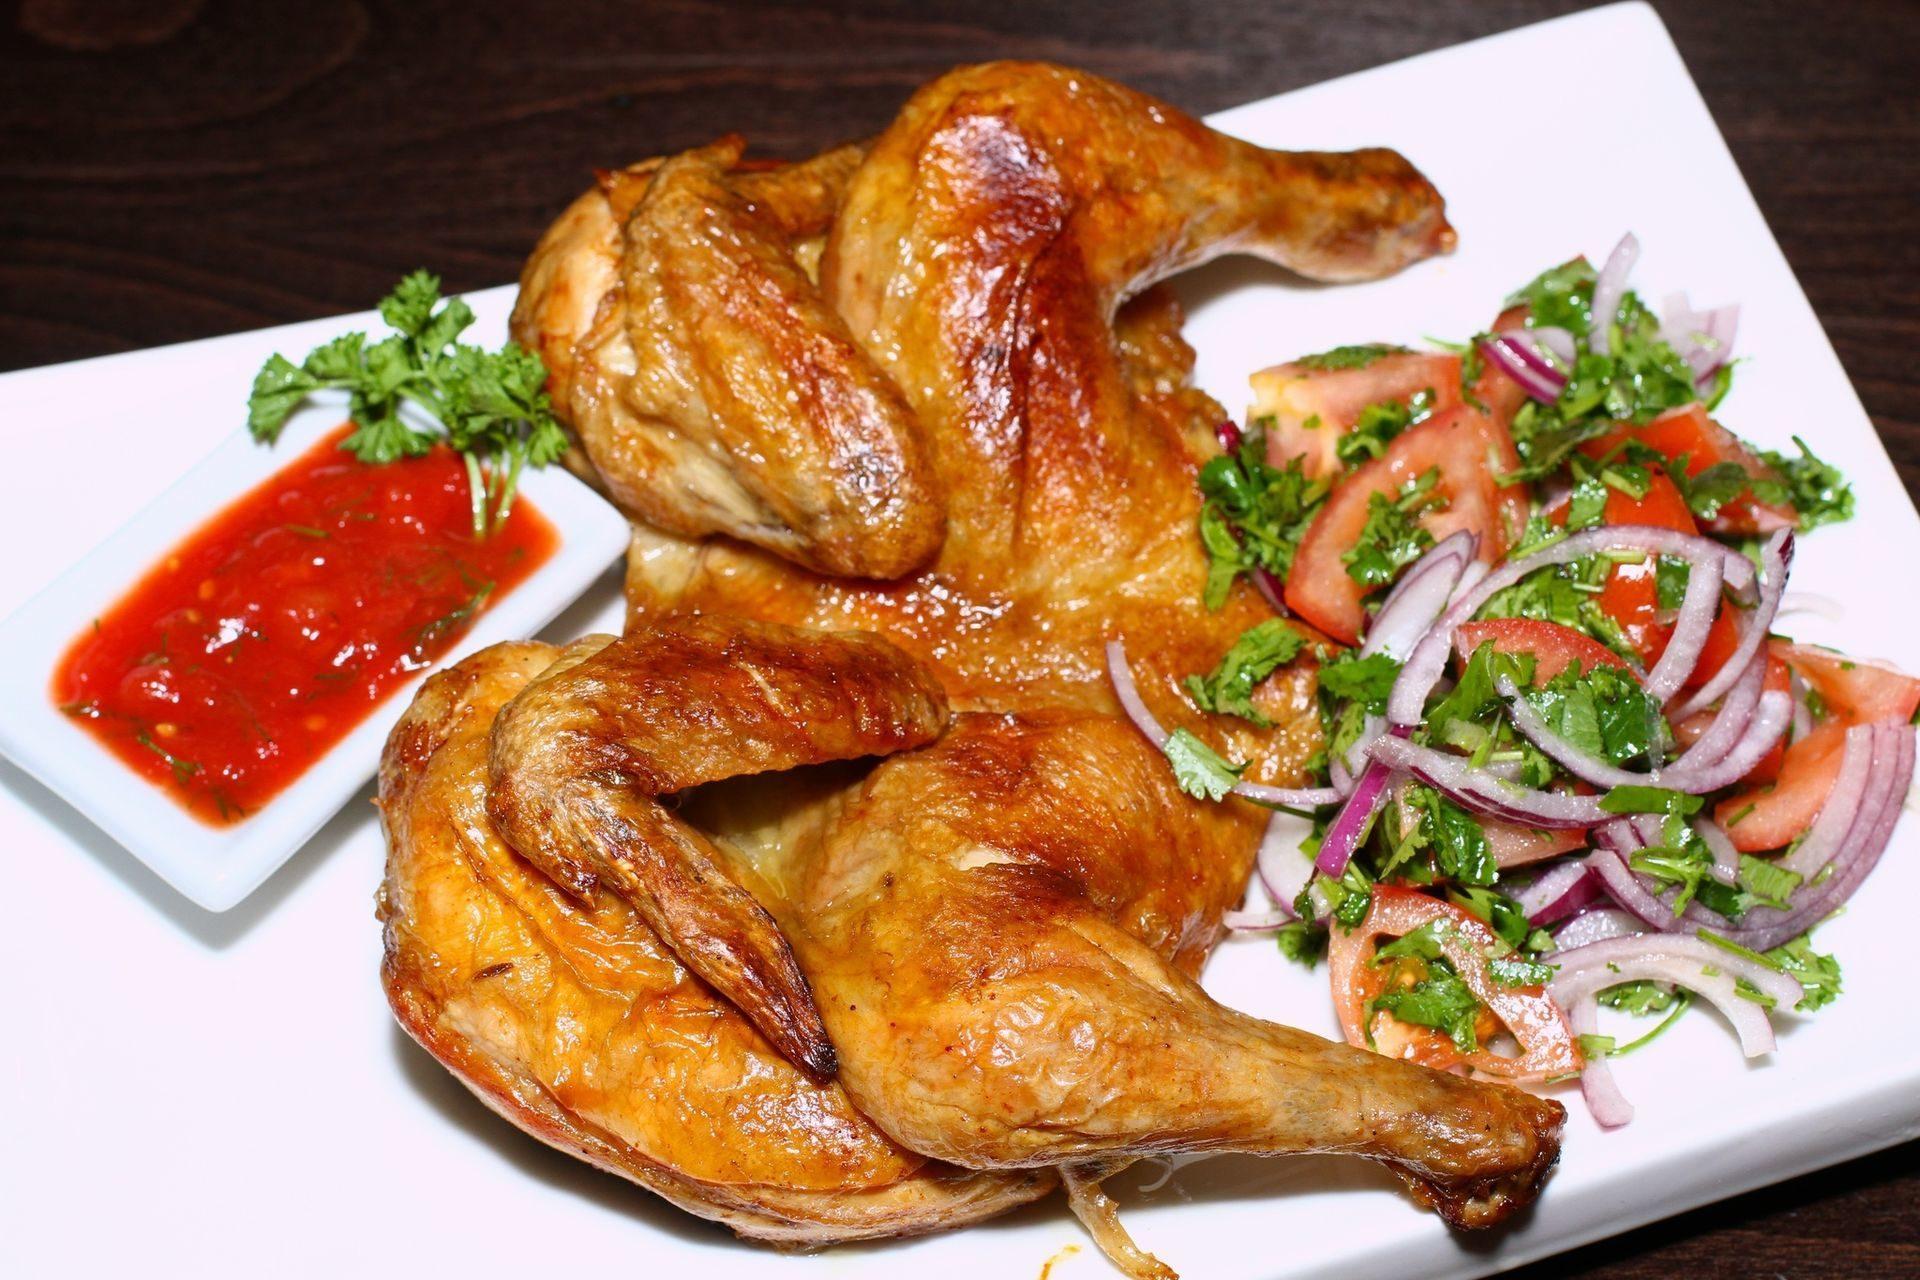 Блюда из жареной птицы и дичи